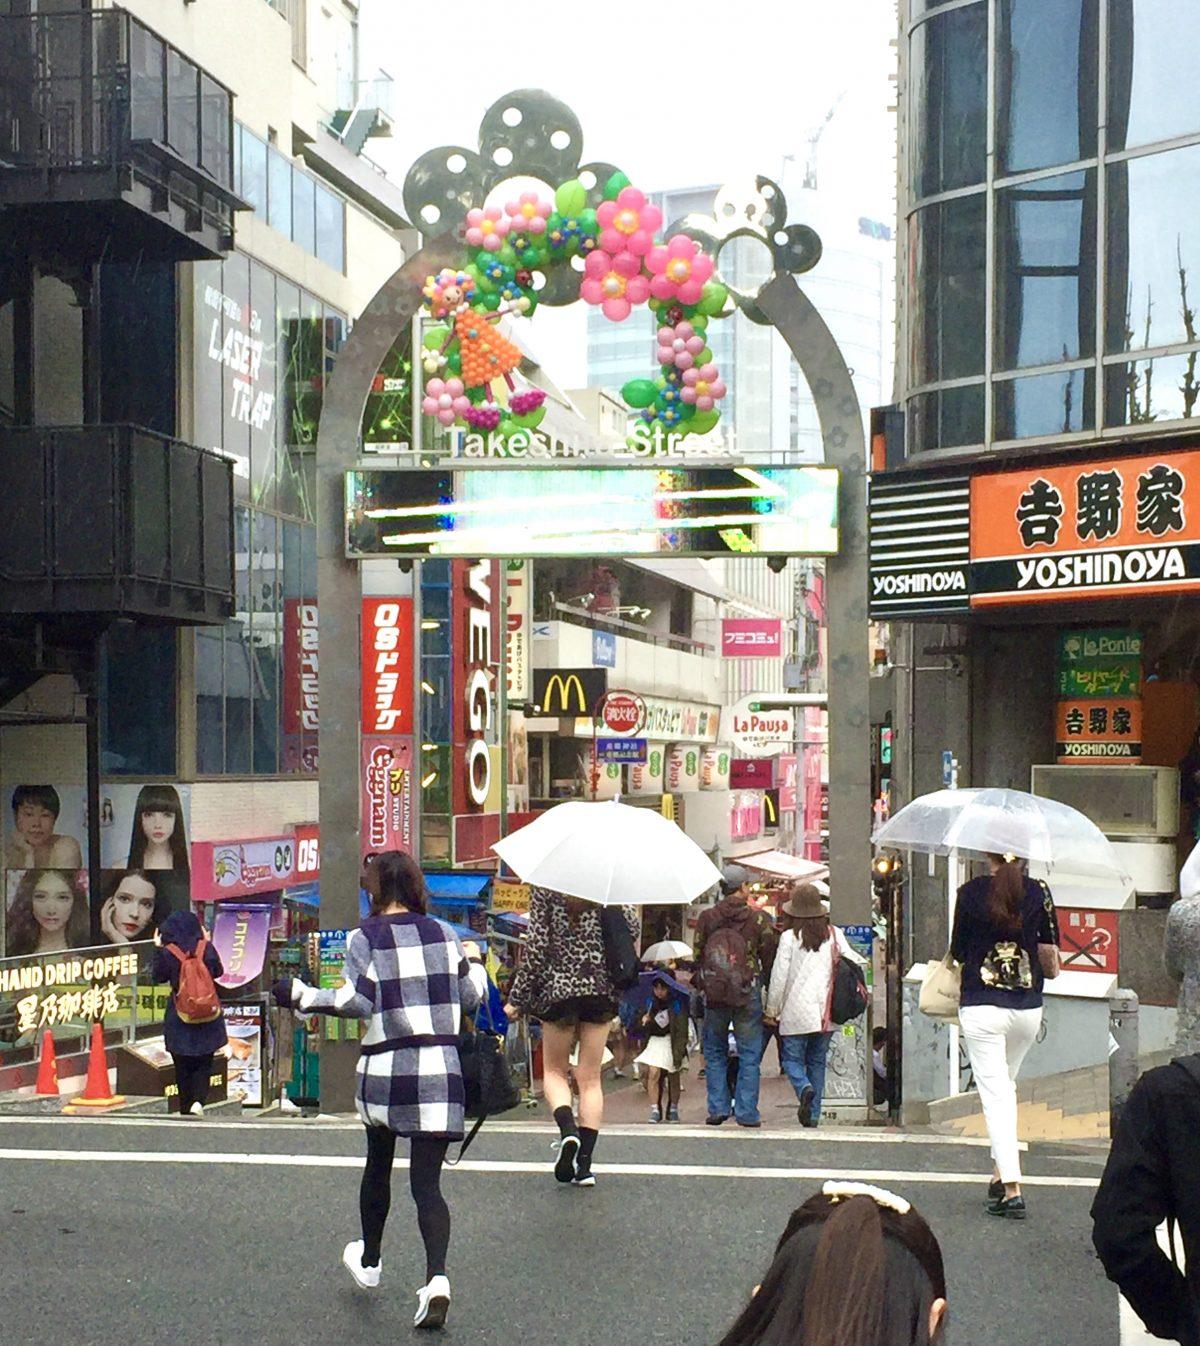 4 days in Tokyo, Harajuku